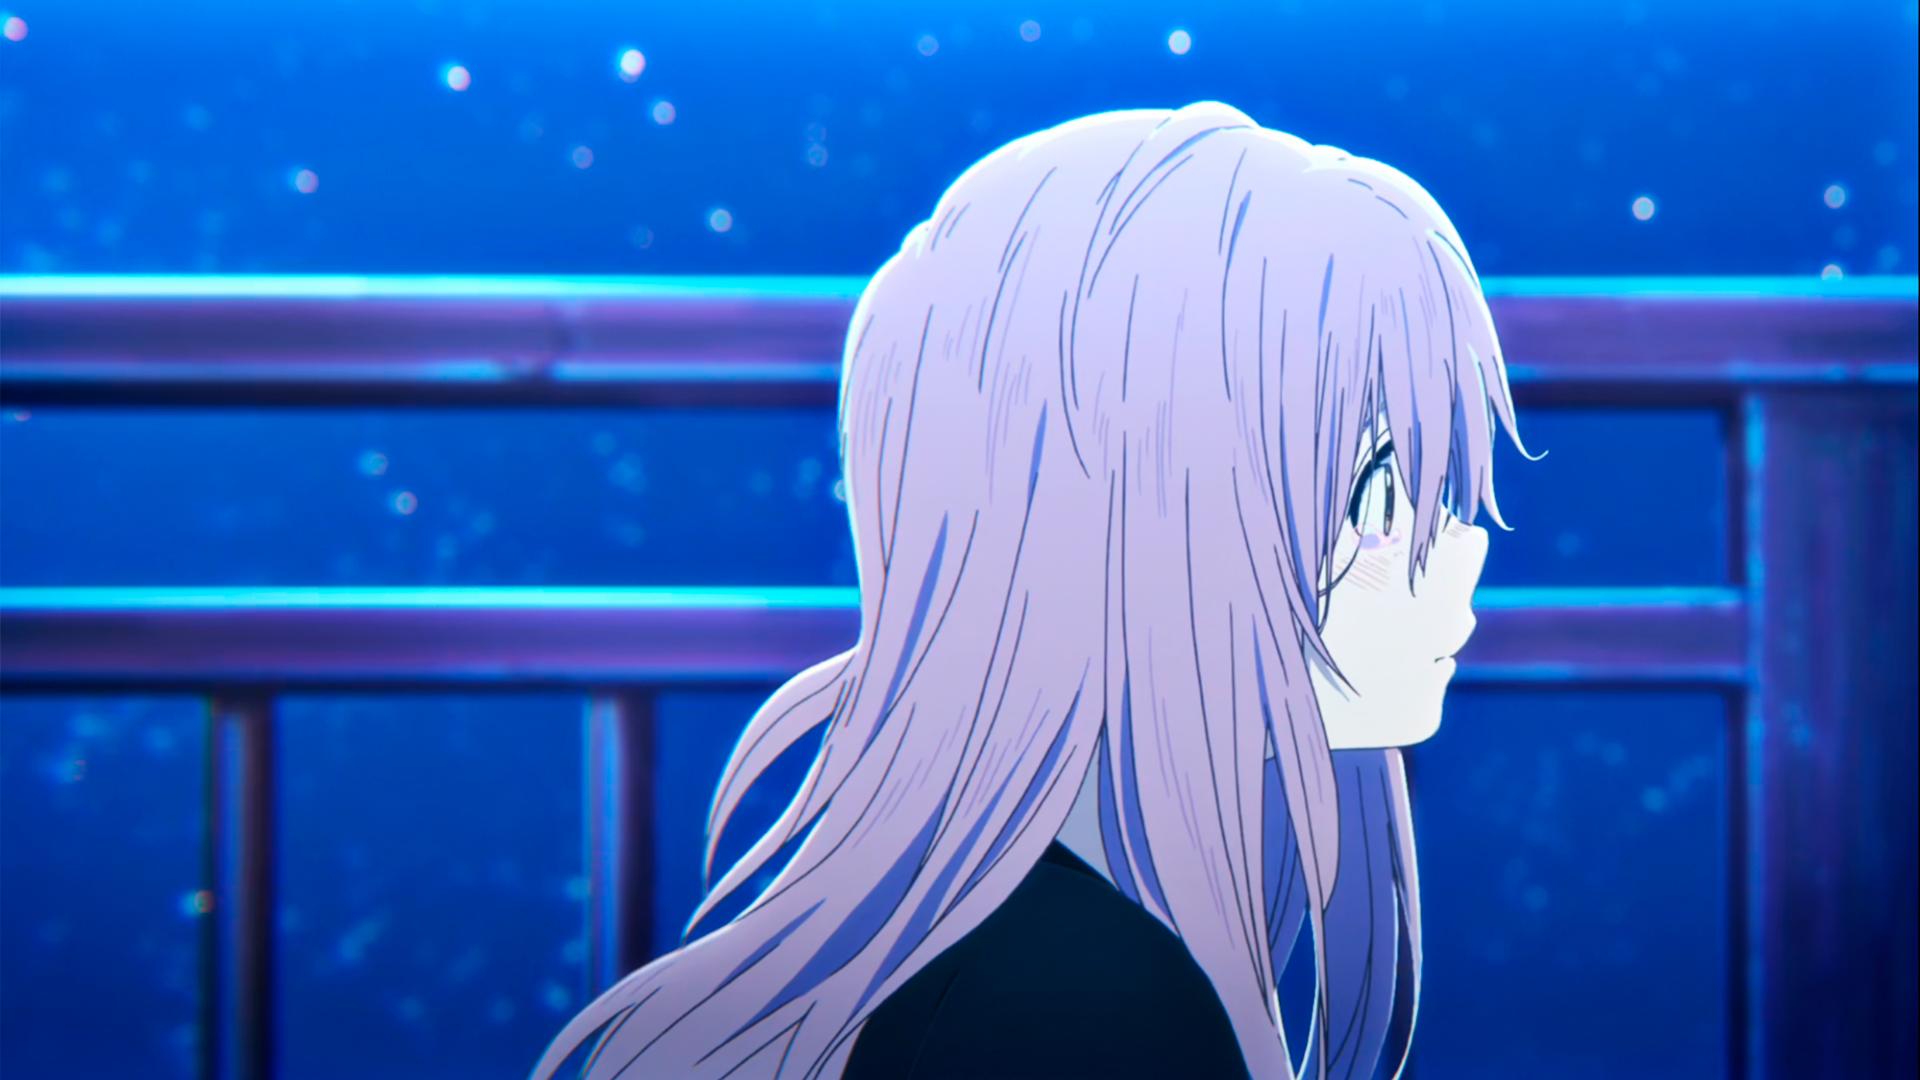 Koe No Katachi Background